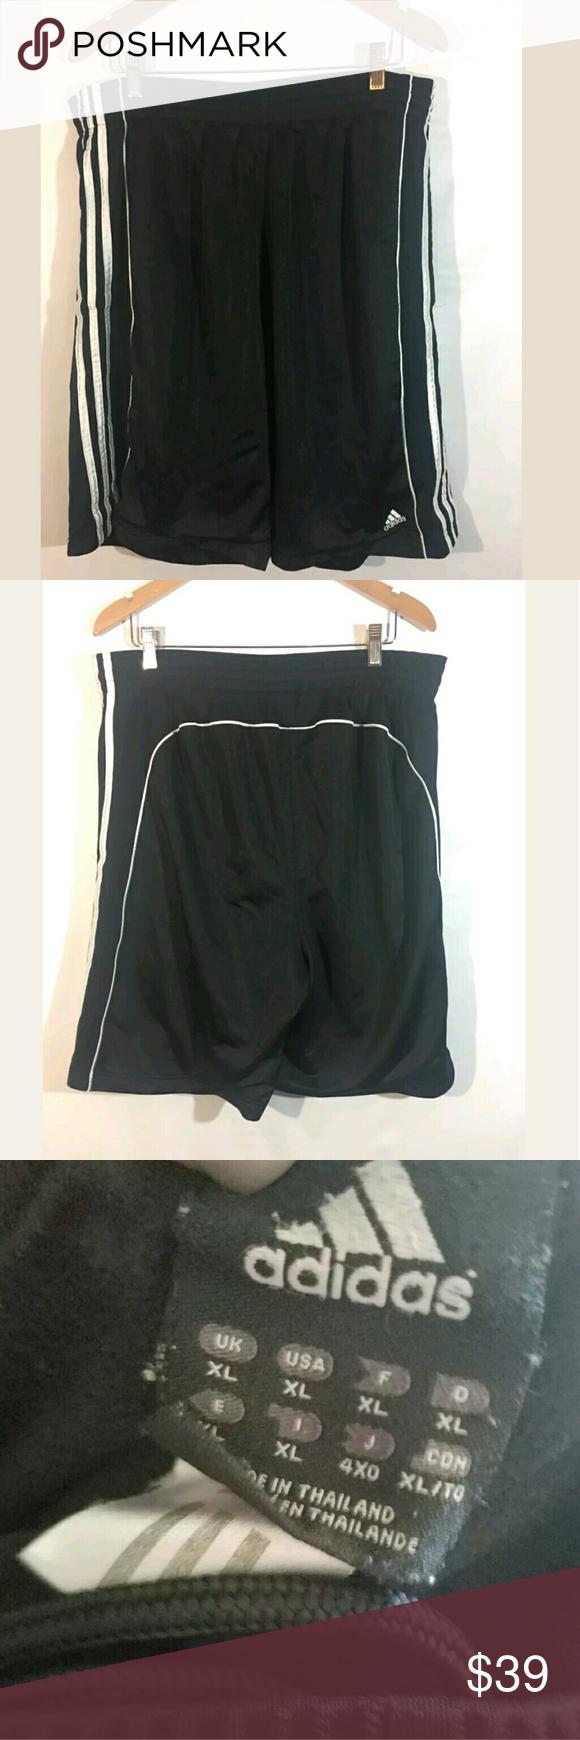 Http Store F4nch61fhtml Https Iebayimgcom Minimal Cropped Jumpsuit Jet Black Fs Hitam Xl 0eb43a844dbe6c90398e9ddd2db83516